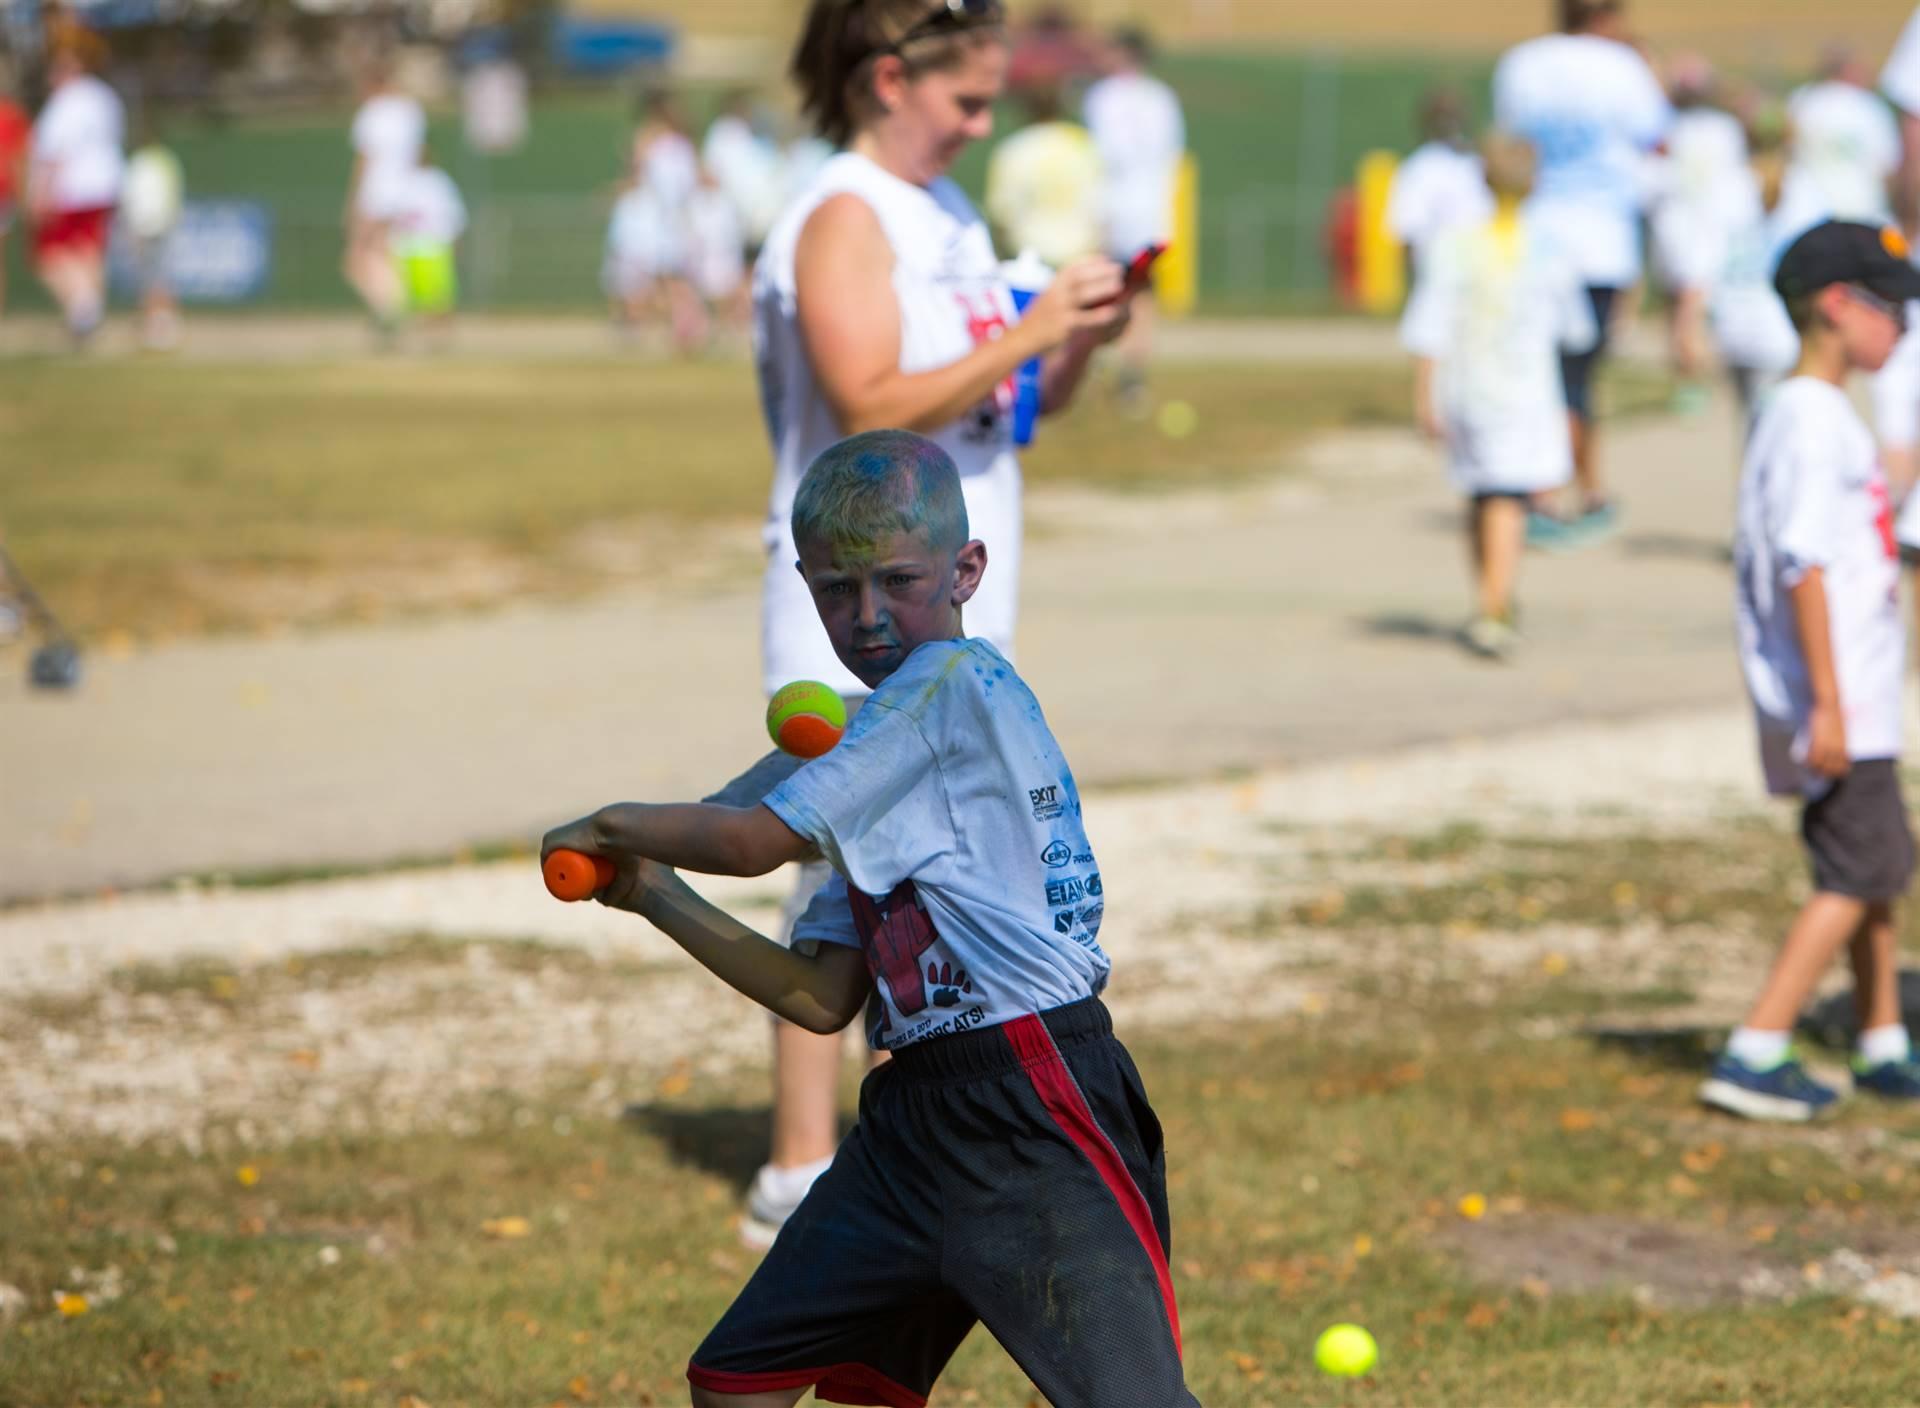 boy hitting ball with bat 2